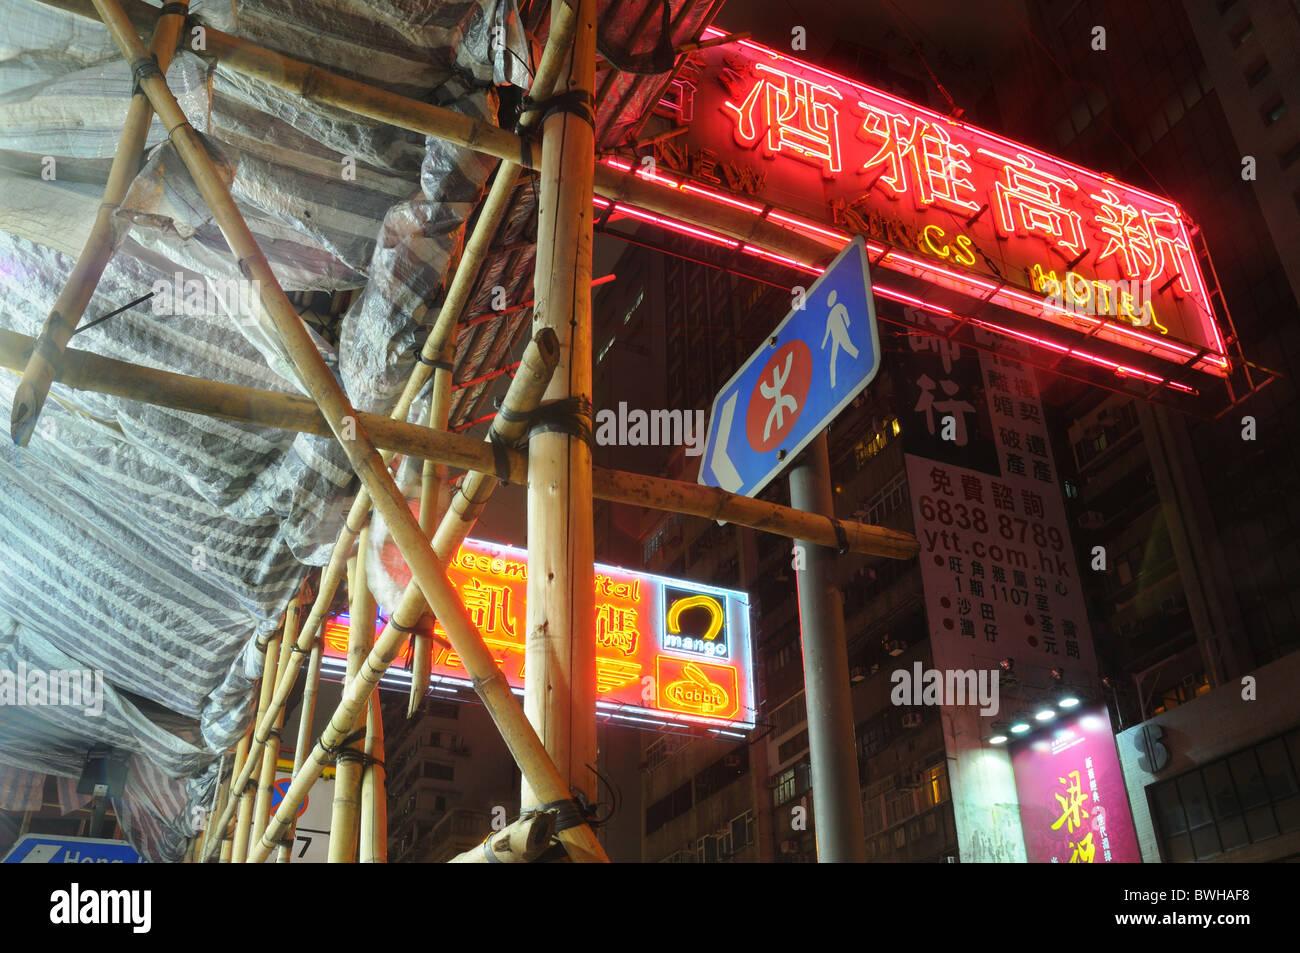 Bamboo scaffolding in Hong Kong - Stock Image